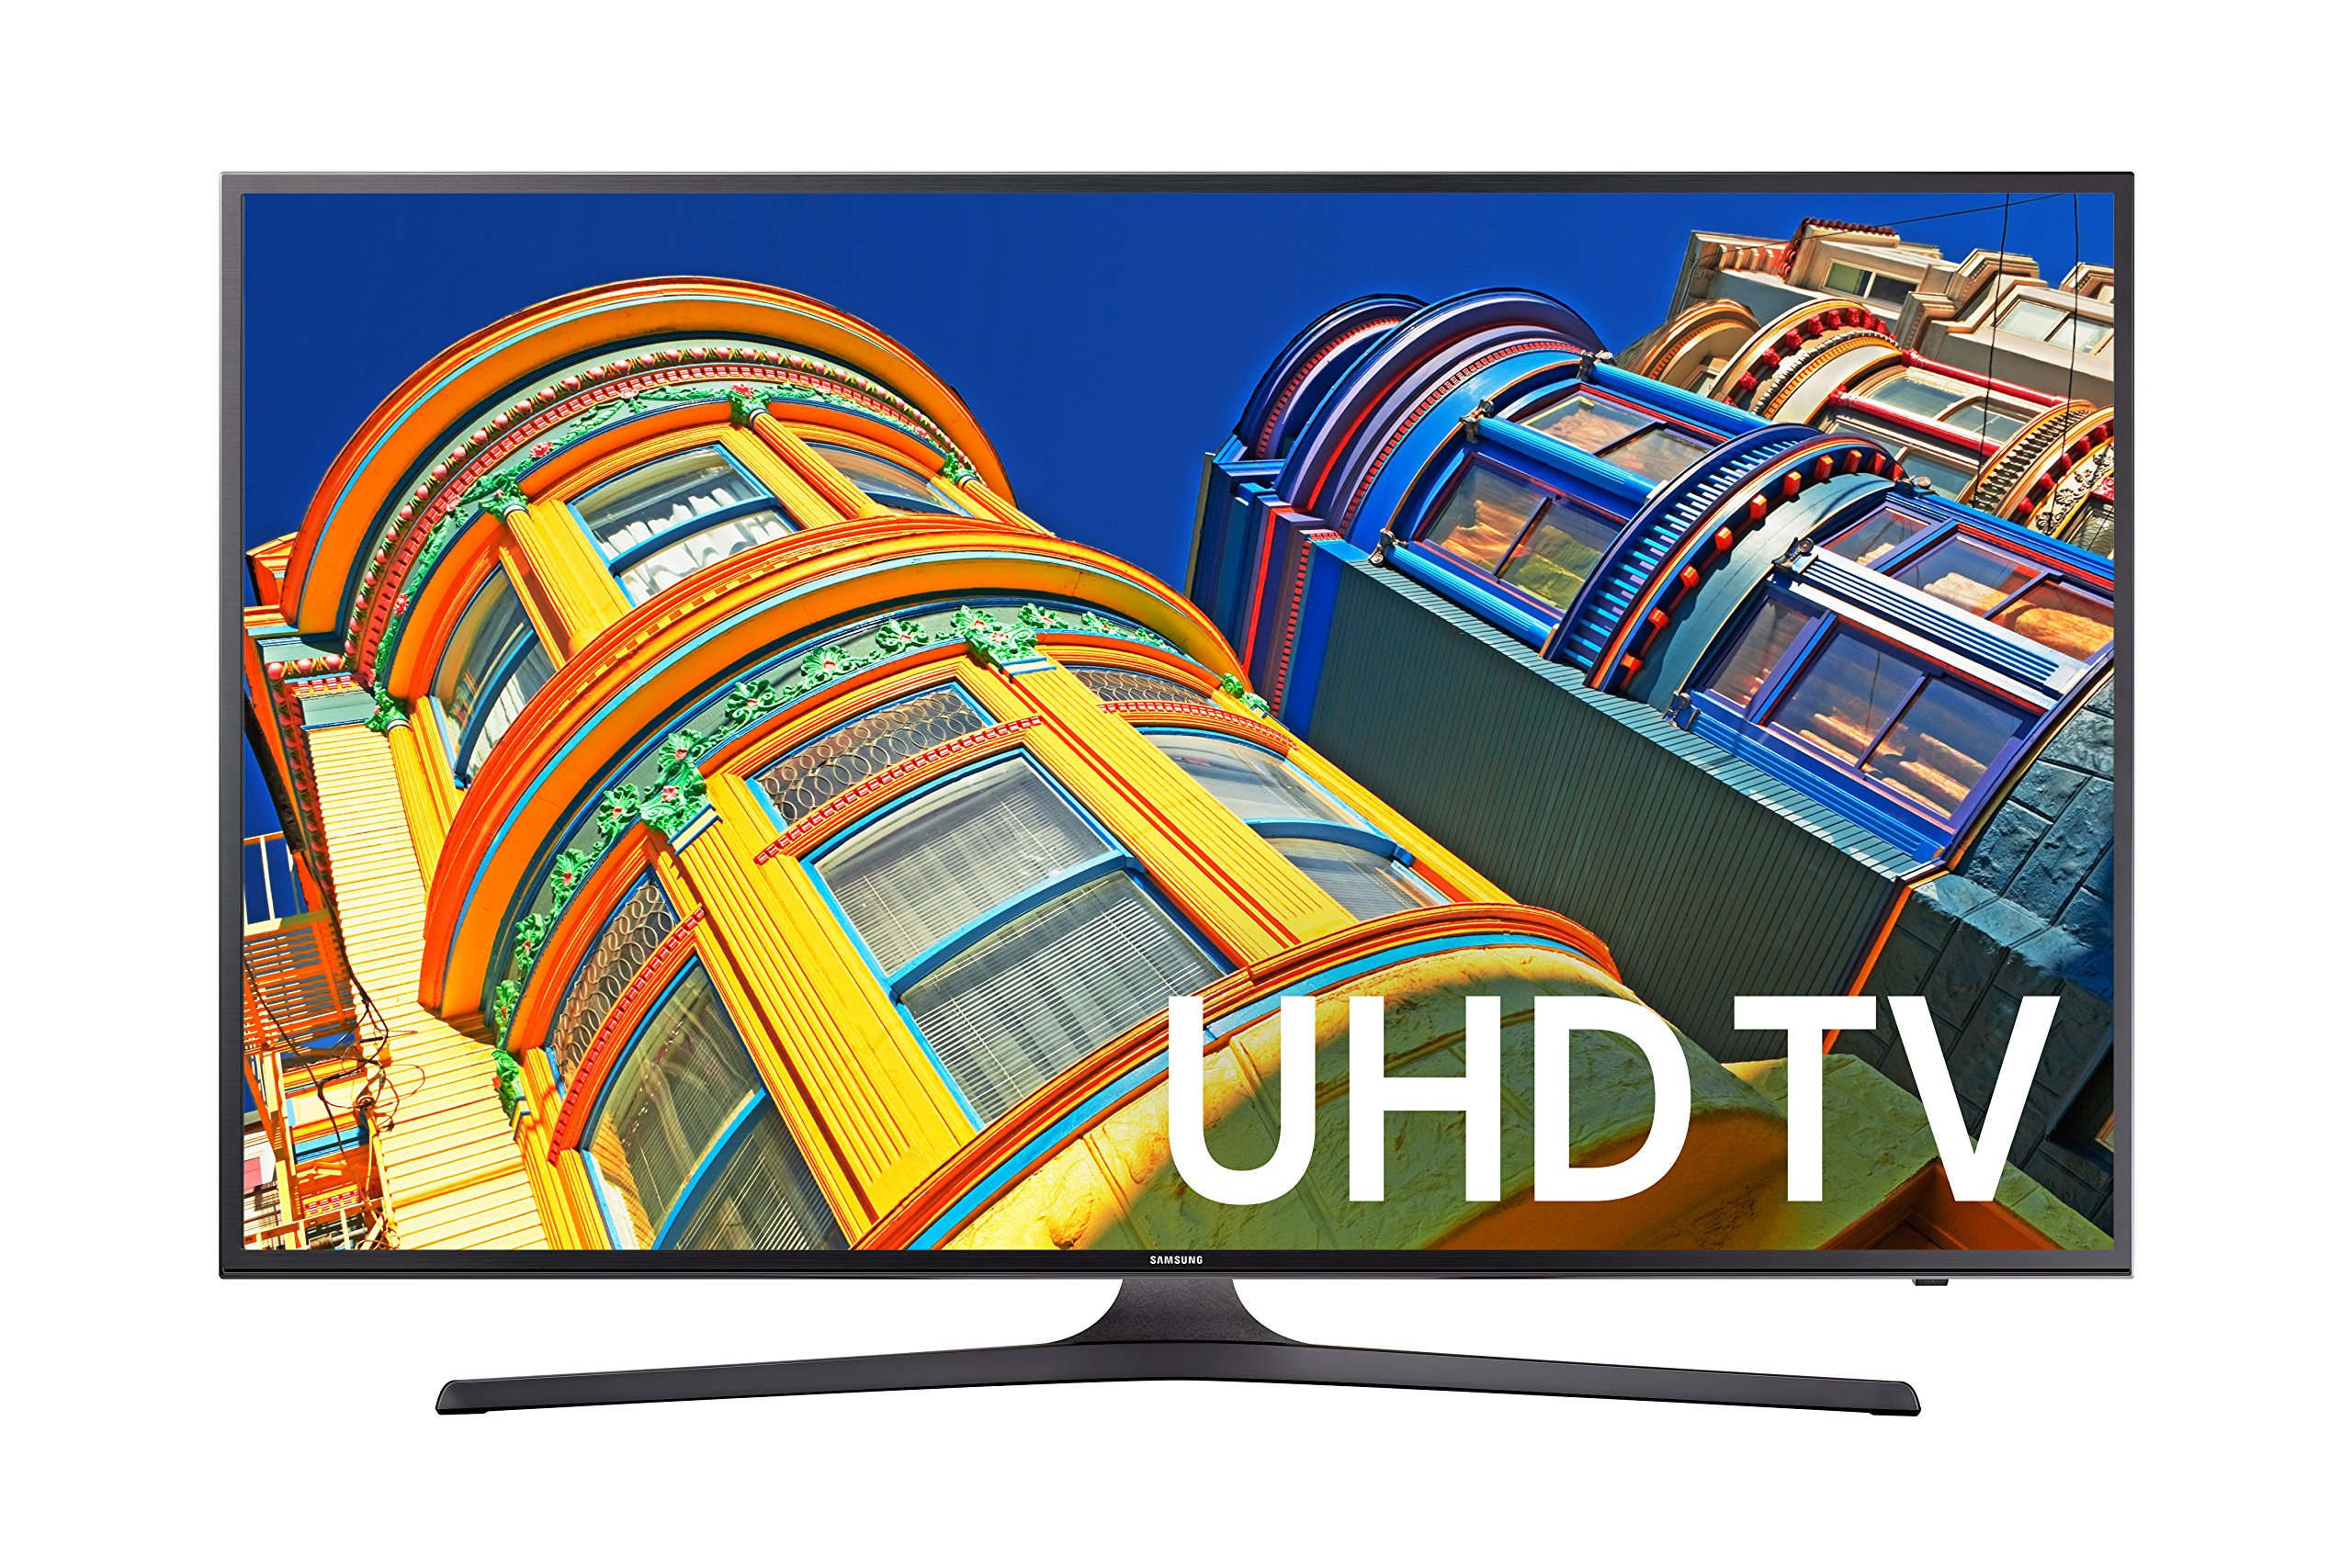 Samsung Curved 4K Ultra HD Smart LED TV2 de 55 Pulgadas: Amazon.es: Electrónica